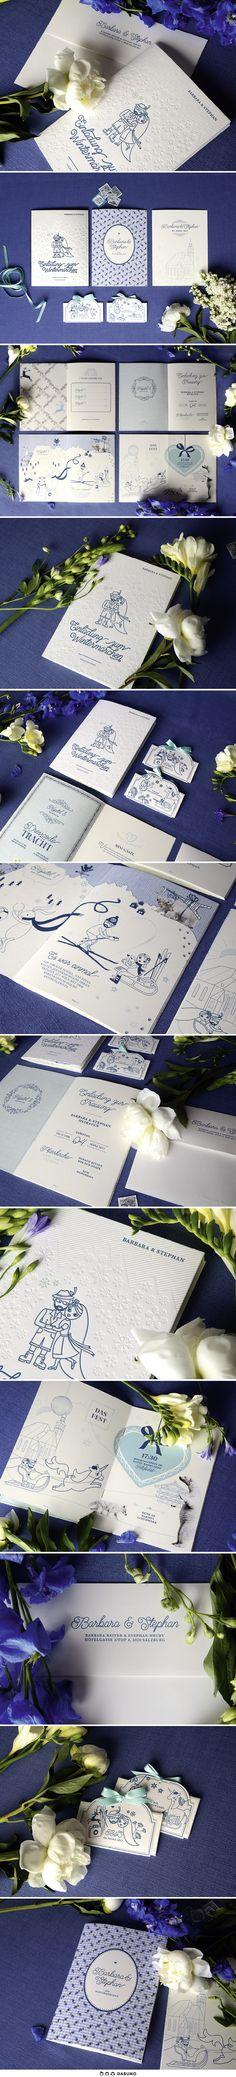 DASUNO // Client: Barbara+&+Stephan // Wedding+Design // 2016 Wedding Designs